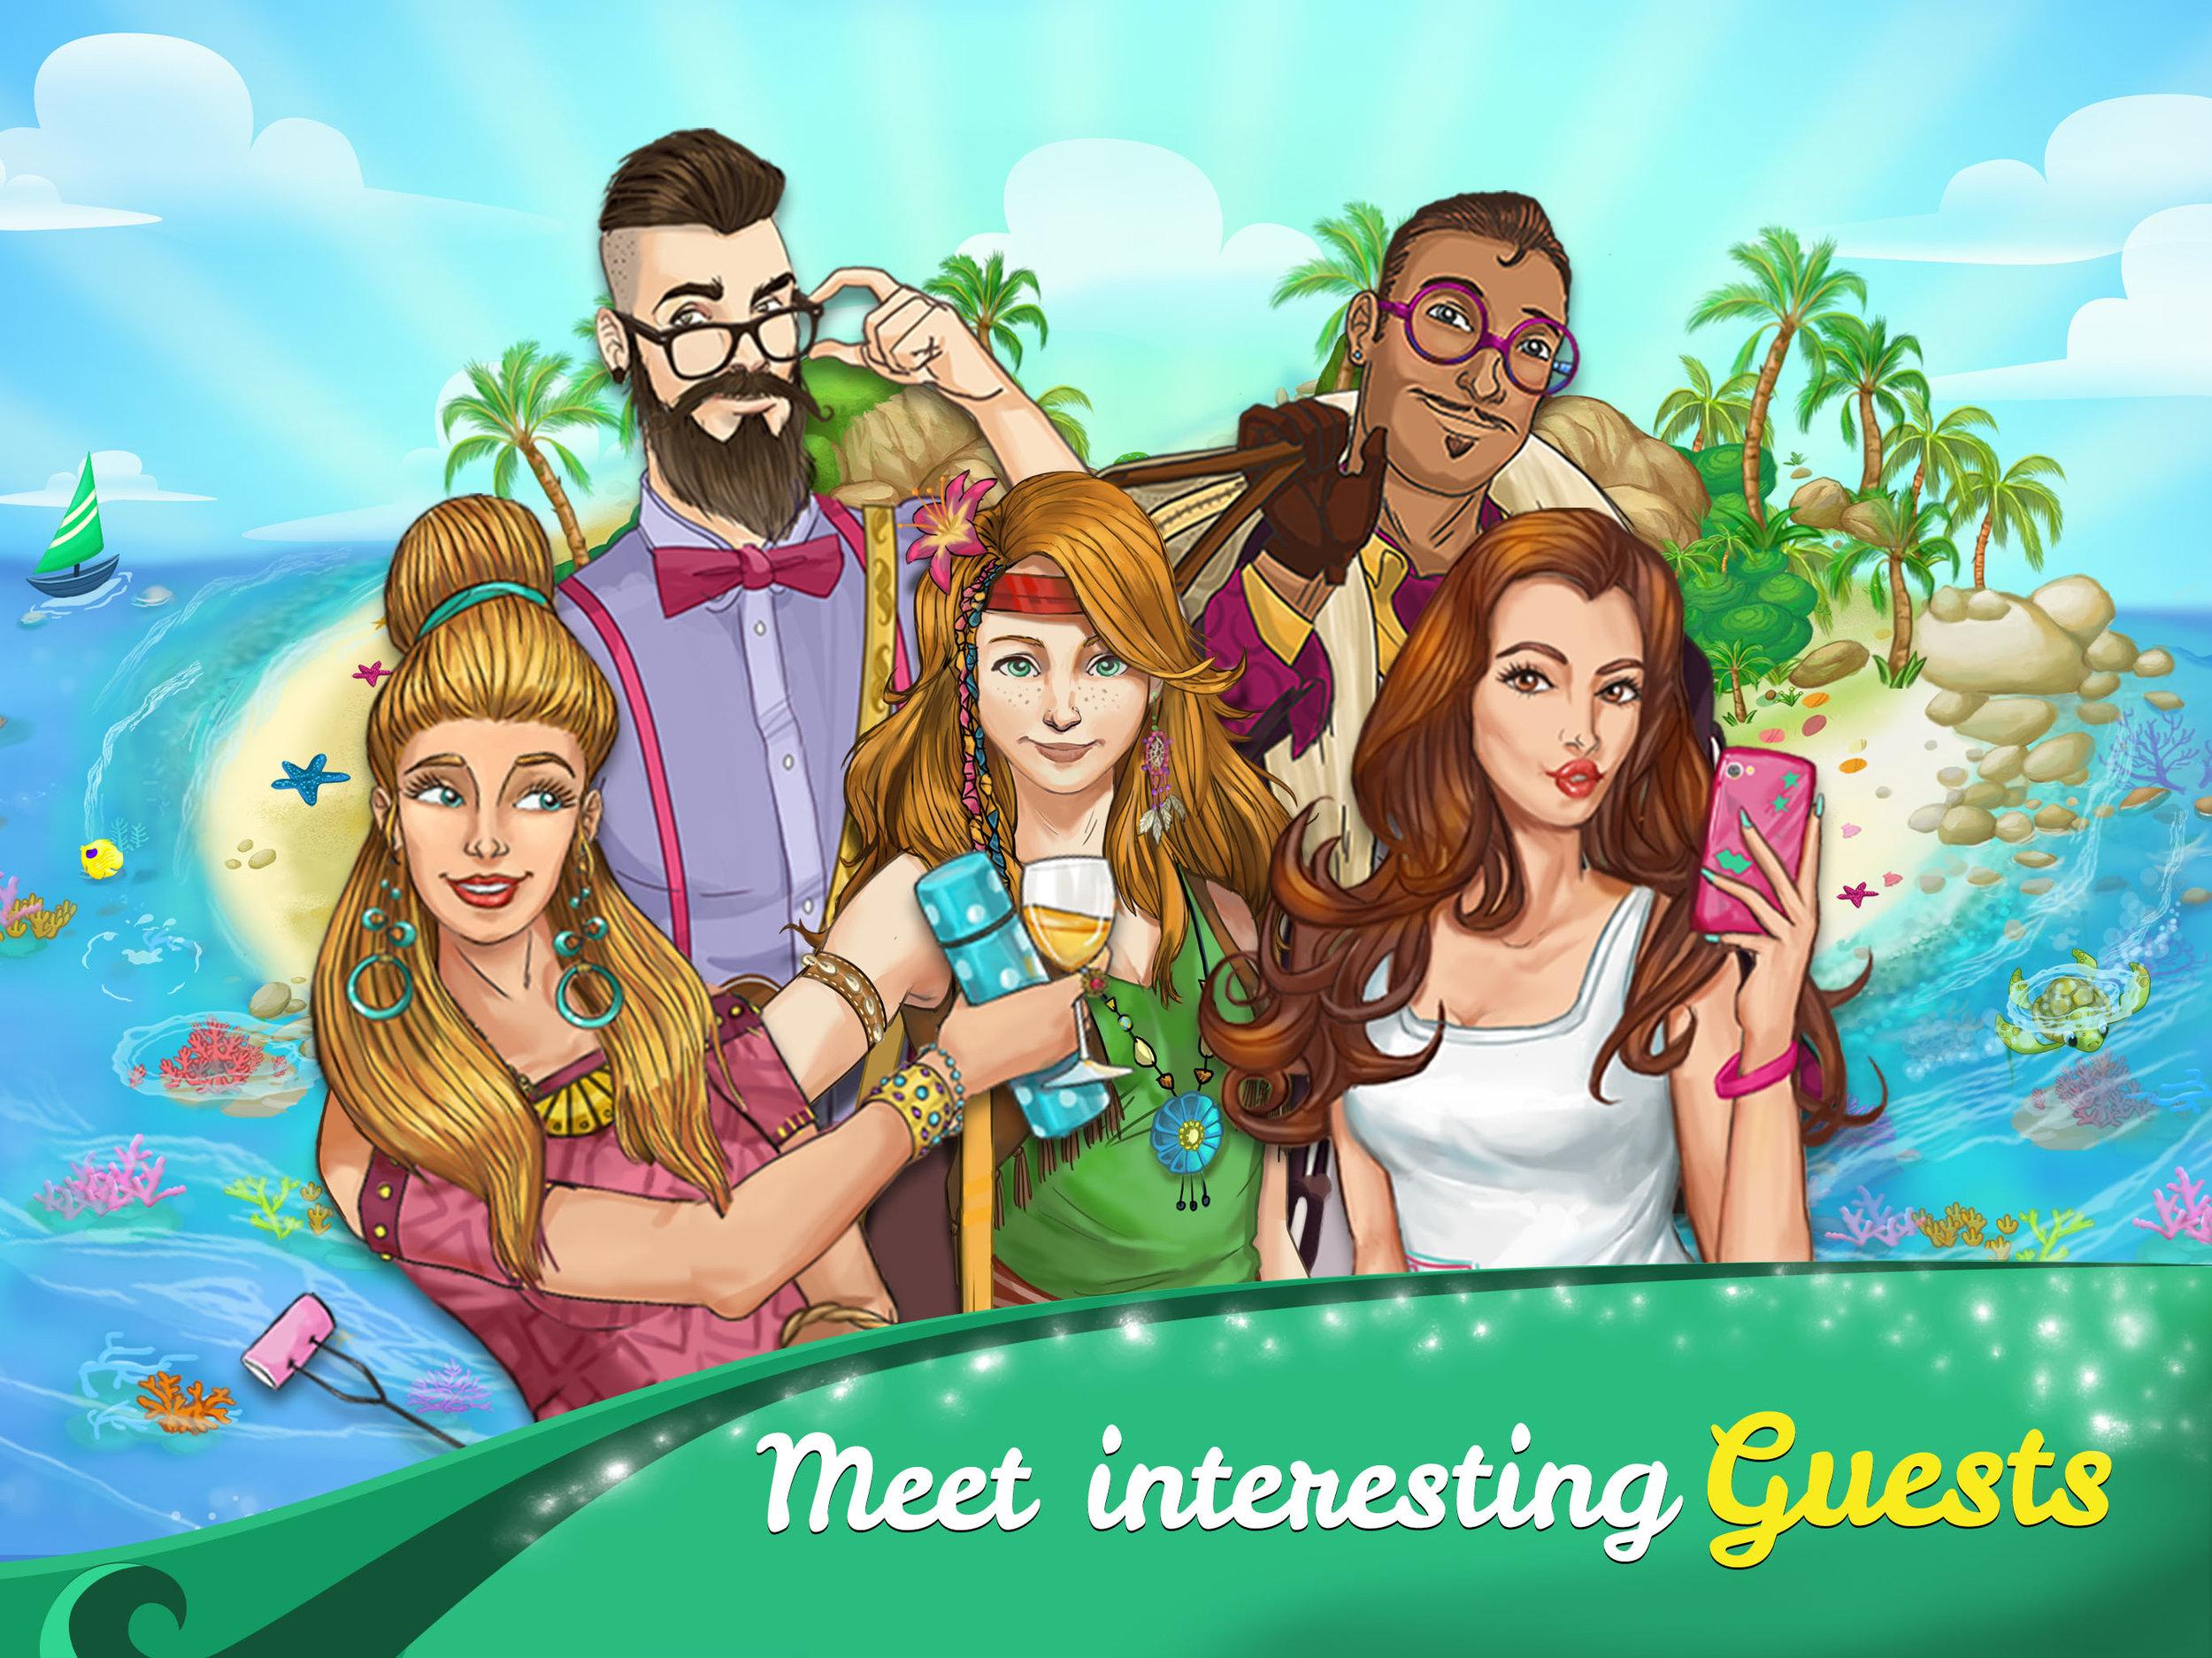 02_Meet_interesting_guest_2018_iPad.jpg